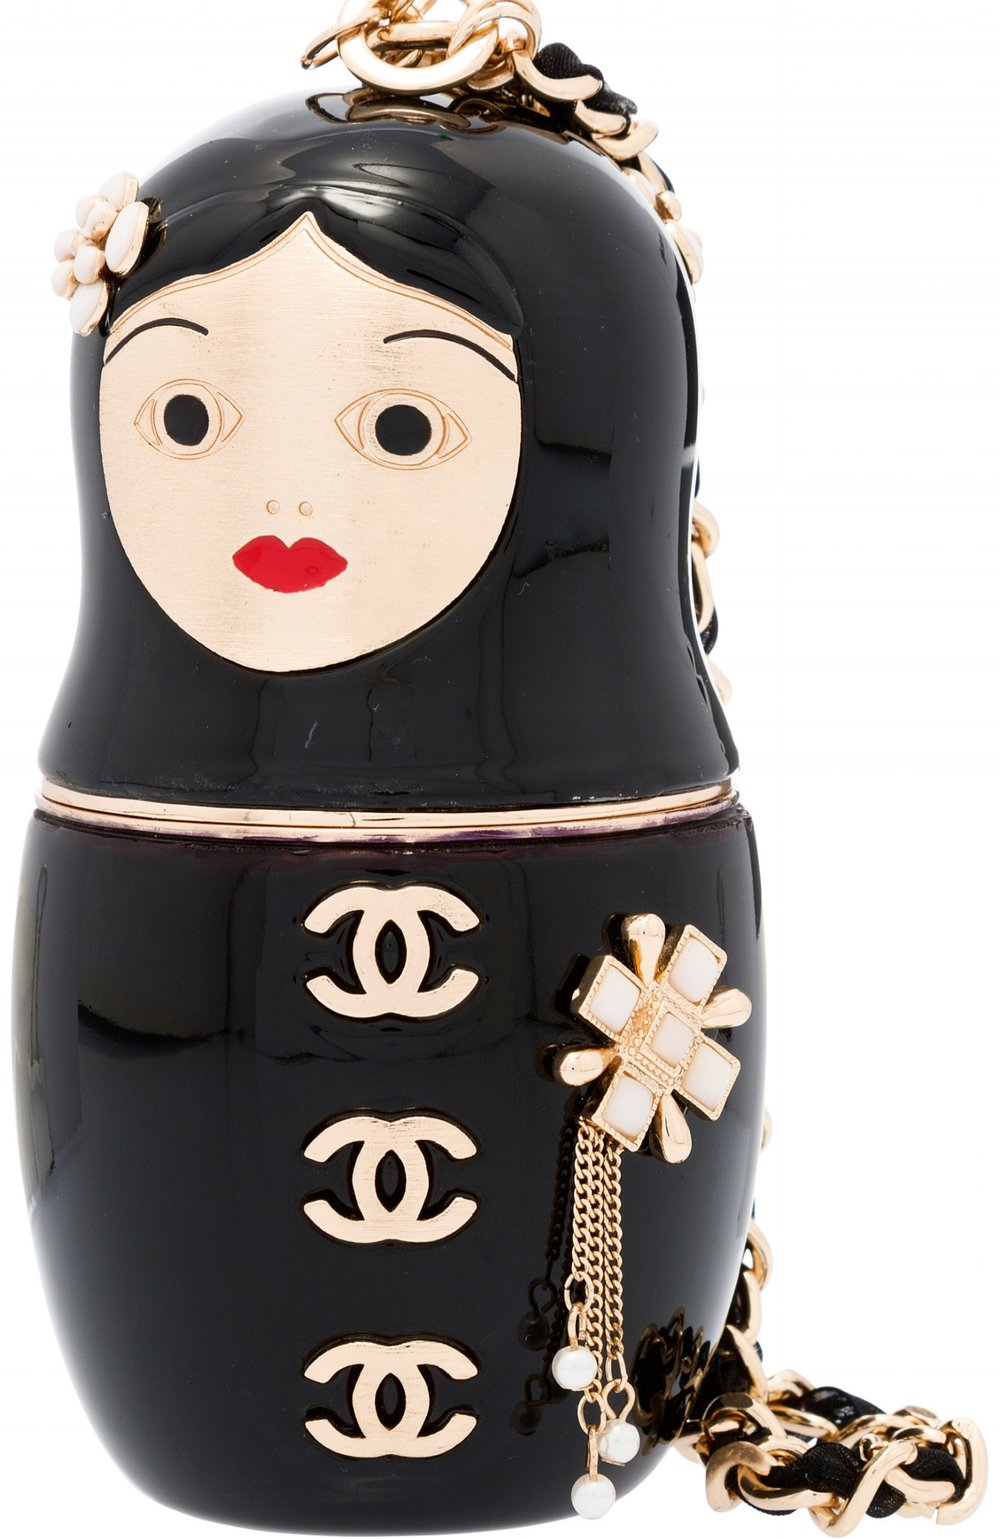 Black Enamel Matryoshka Doll Evening Bag - SOLD ON HERITAGE AUCTIONS